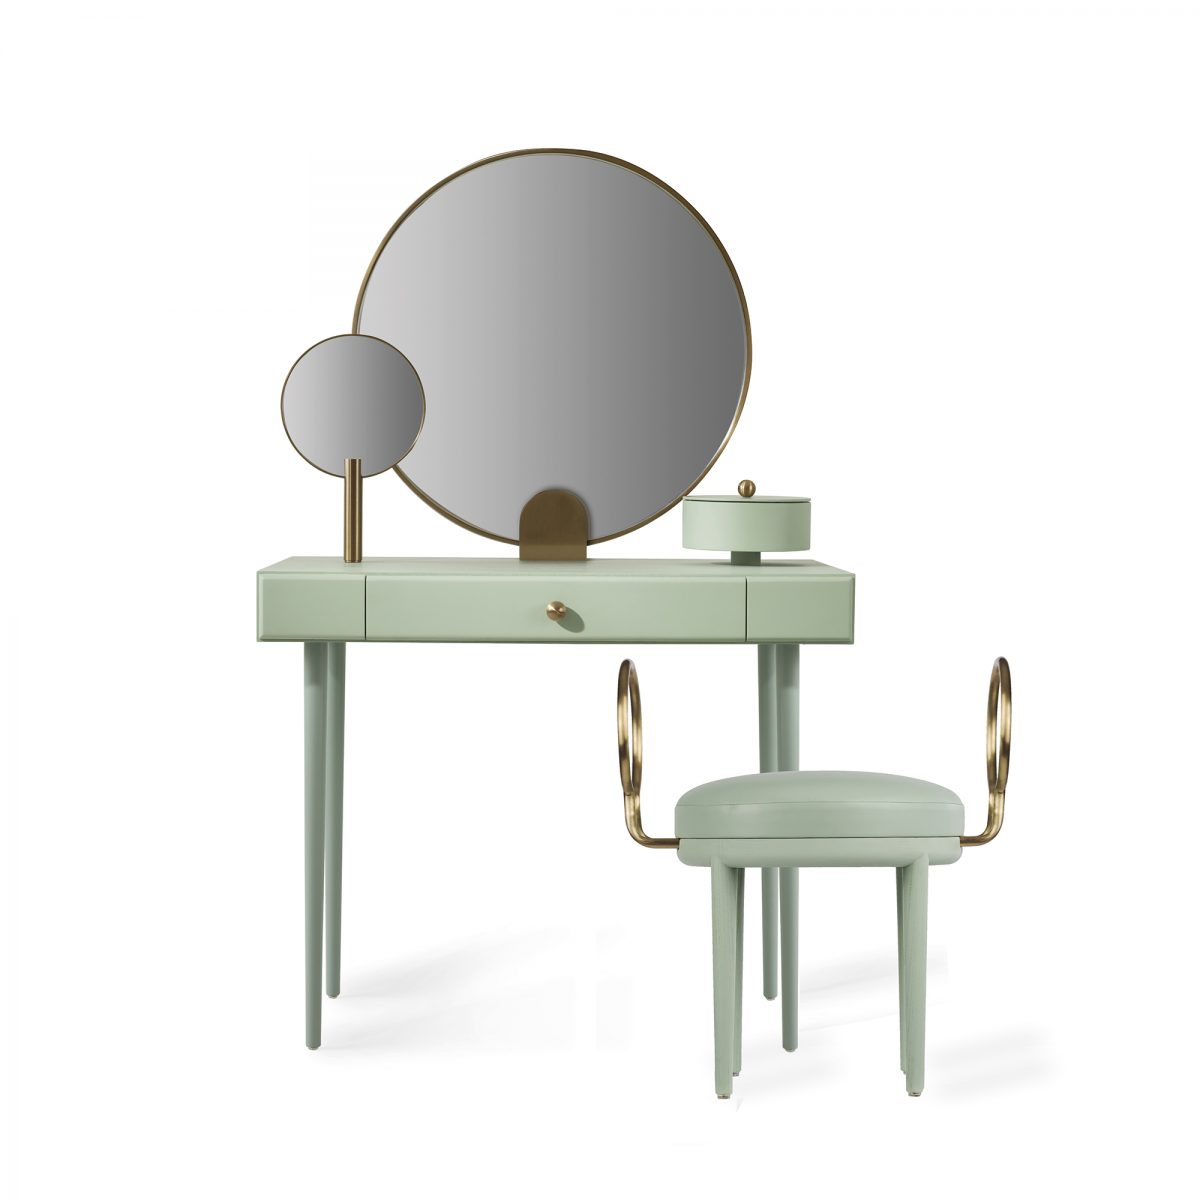 1-maison-dada-rose-selavy-stool-buffets&cabinets-writing-desks-celadon-front